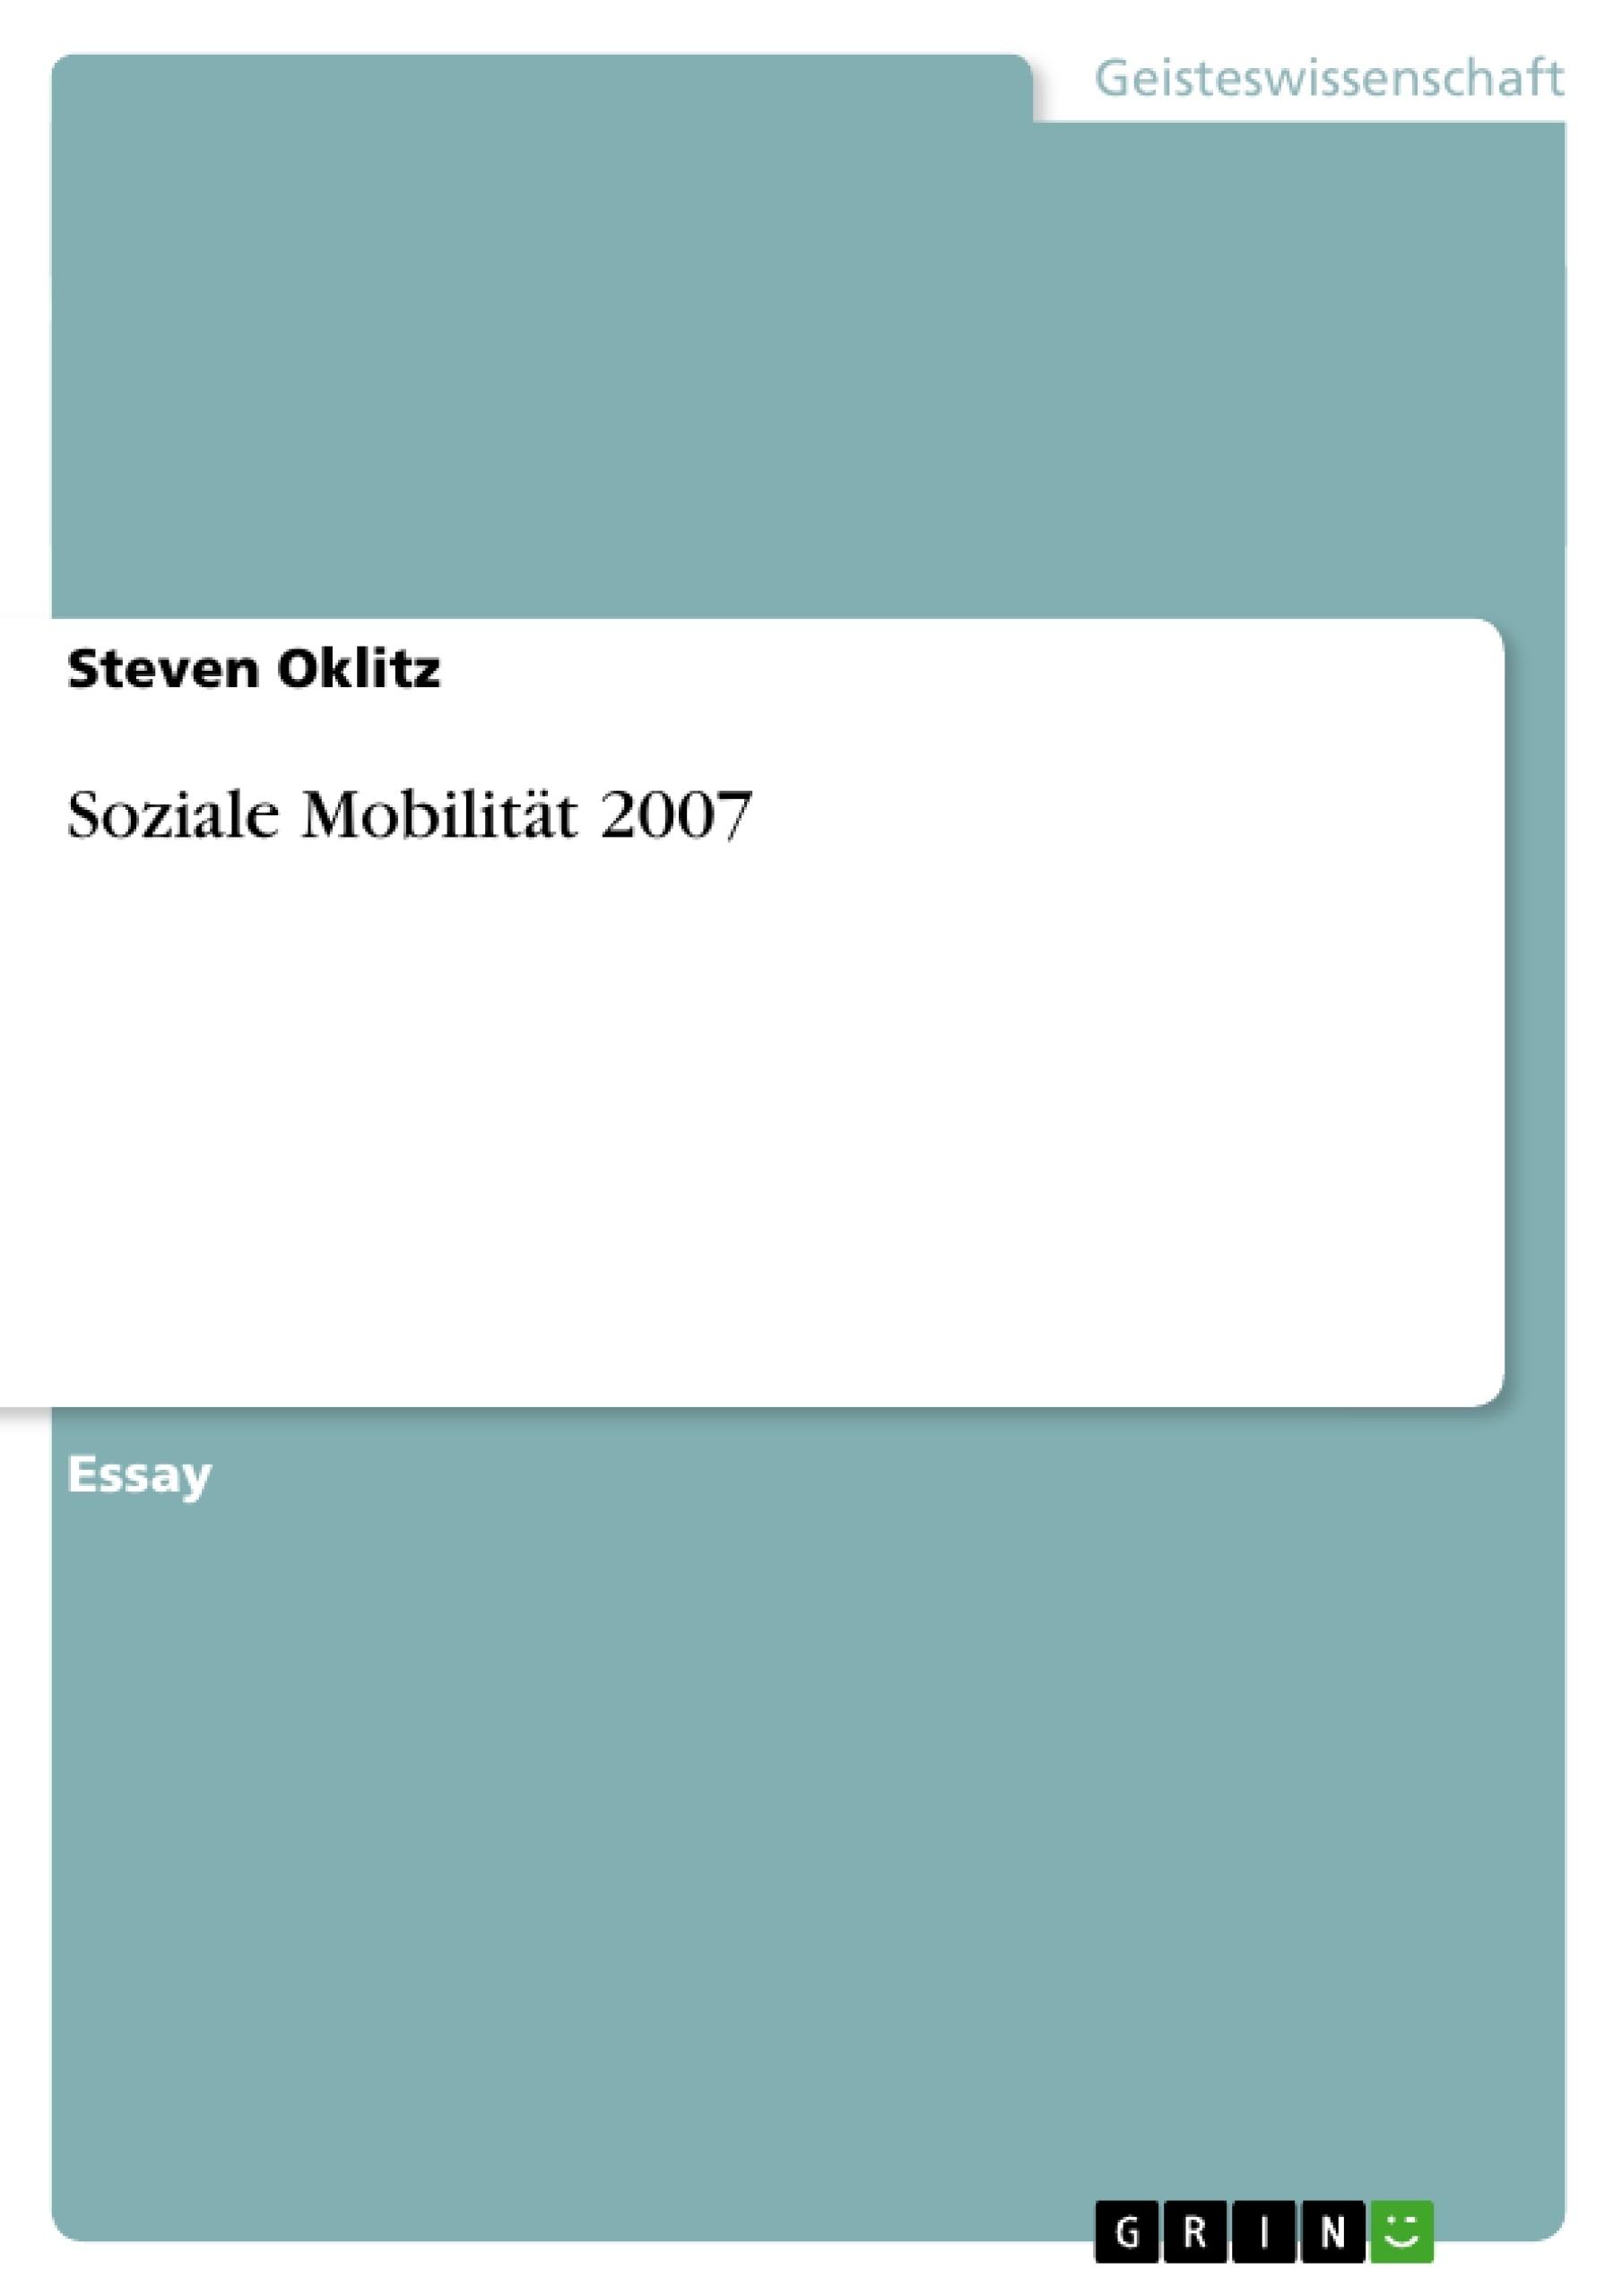 Titel: Soziale Mobilität 2007